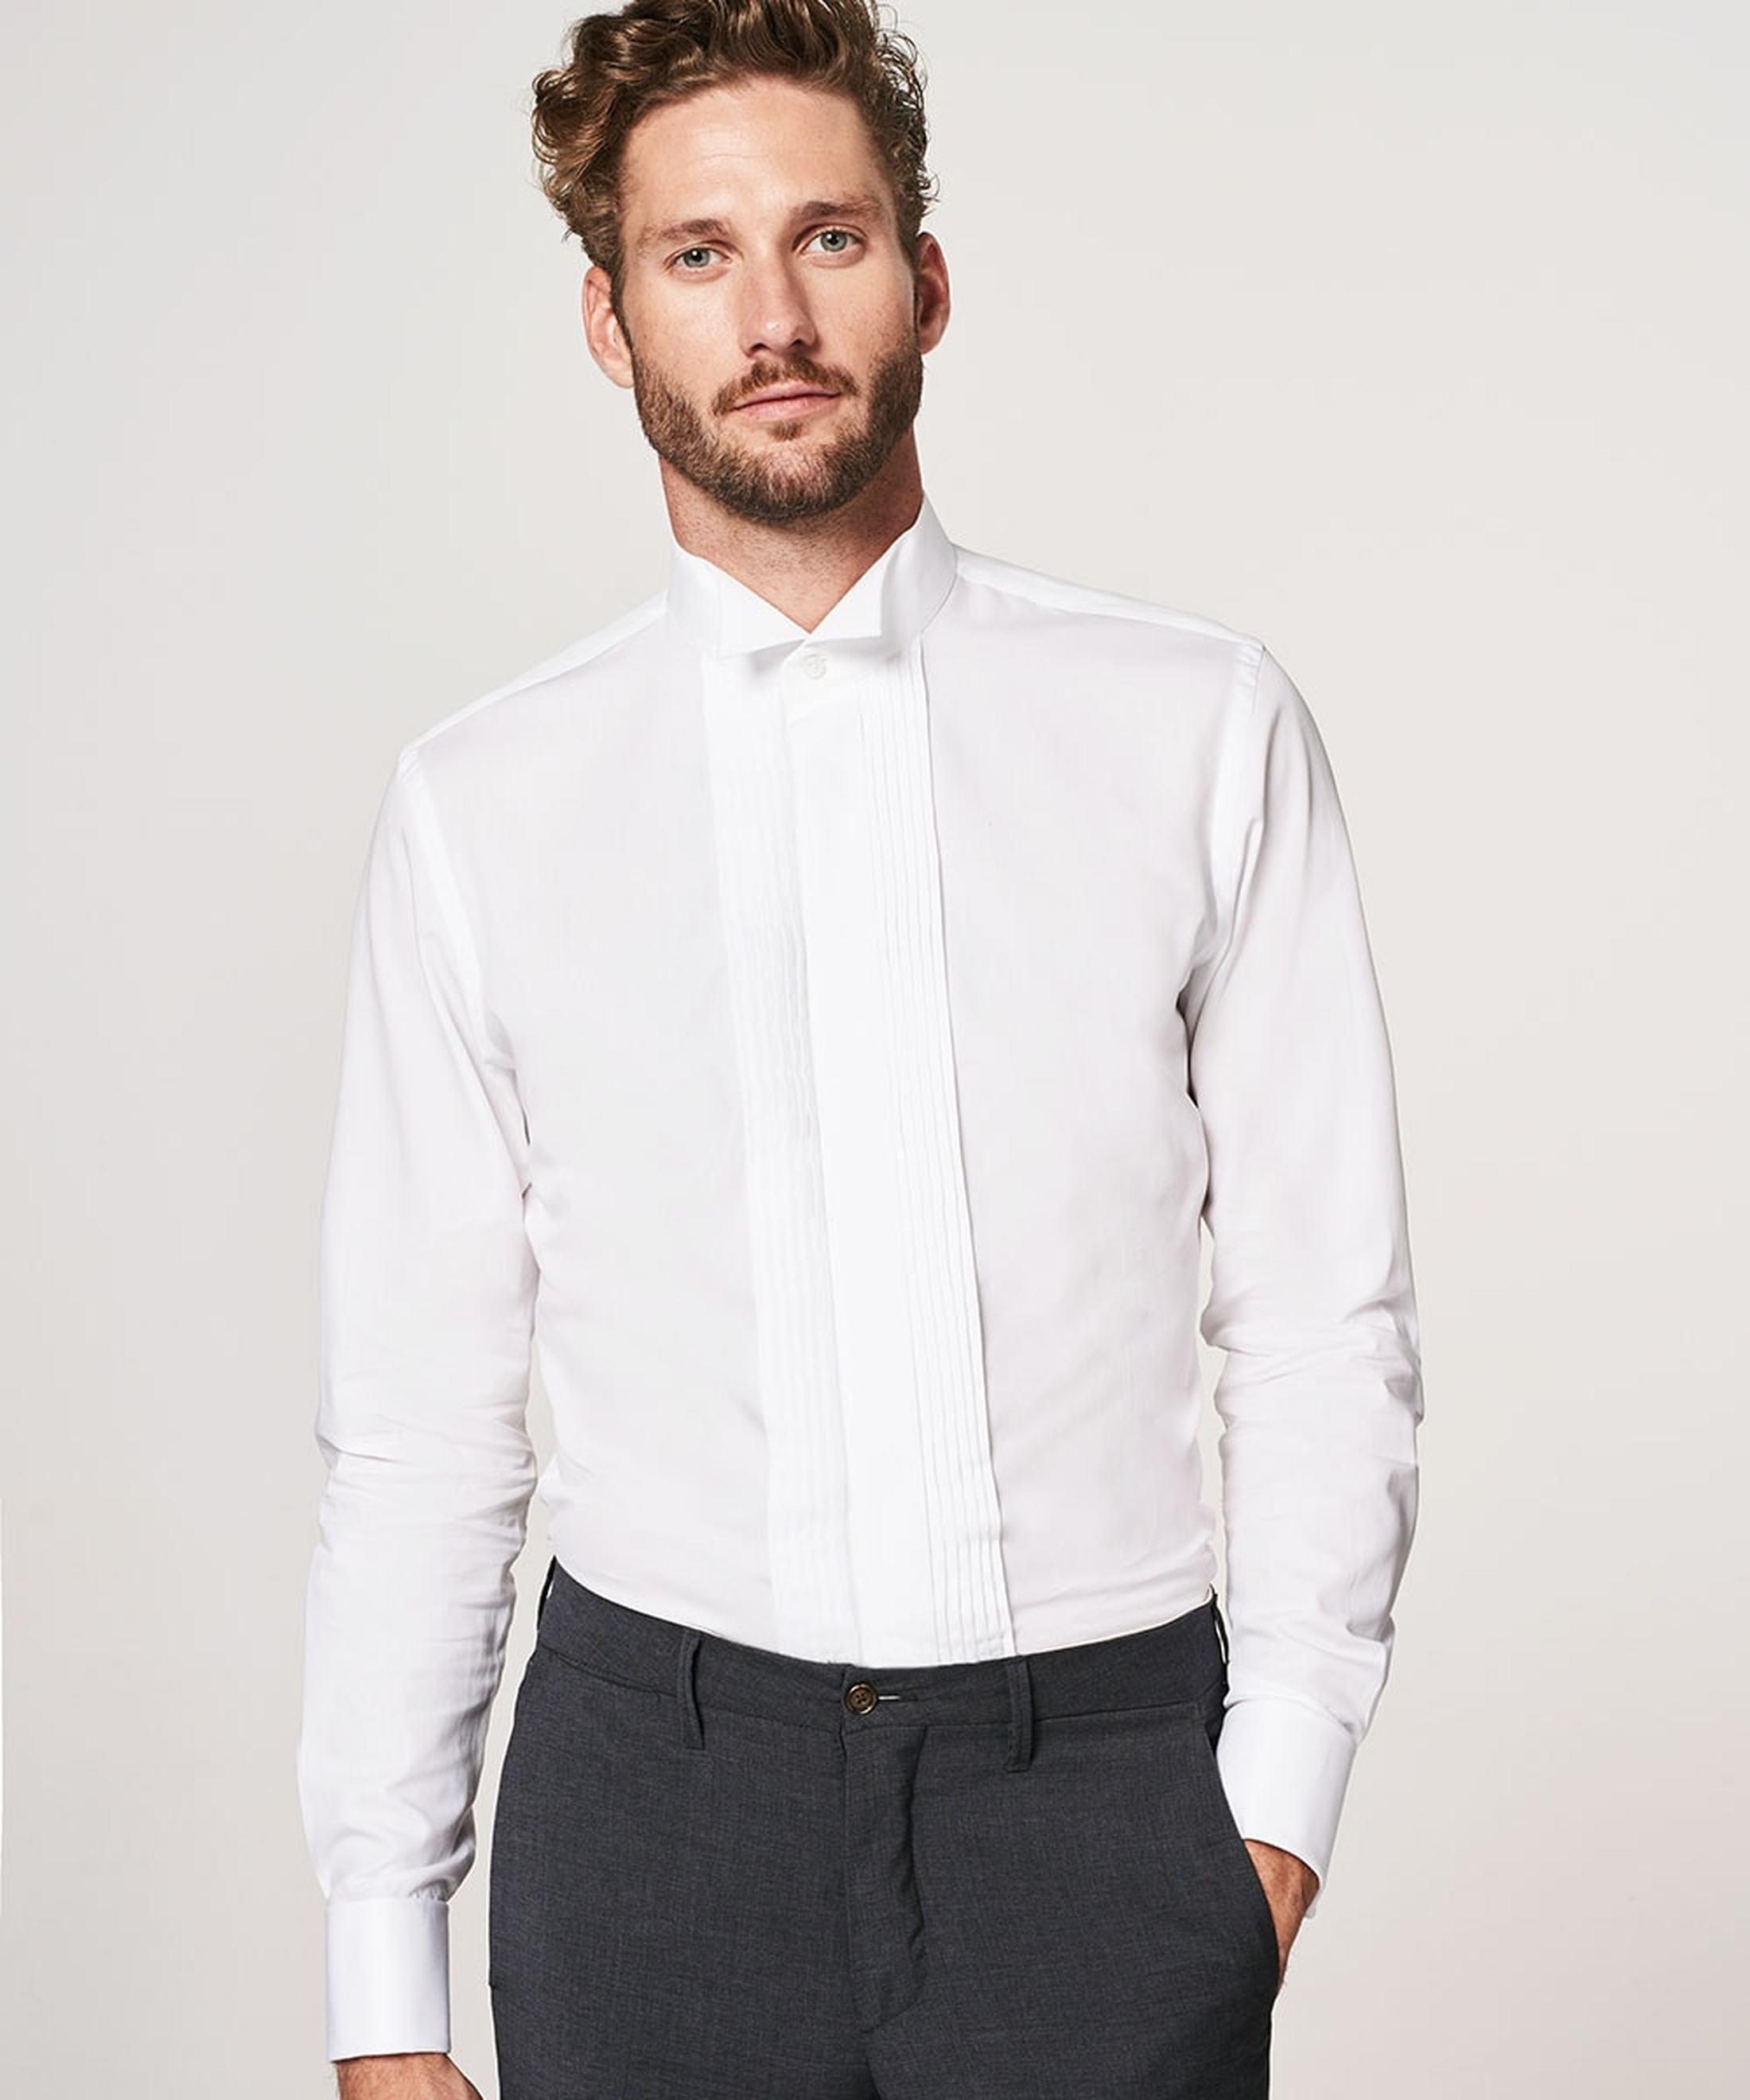 Profuomo Smoking Hemd Plissiert Slim Fit Weiß foto 4